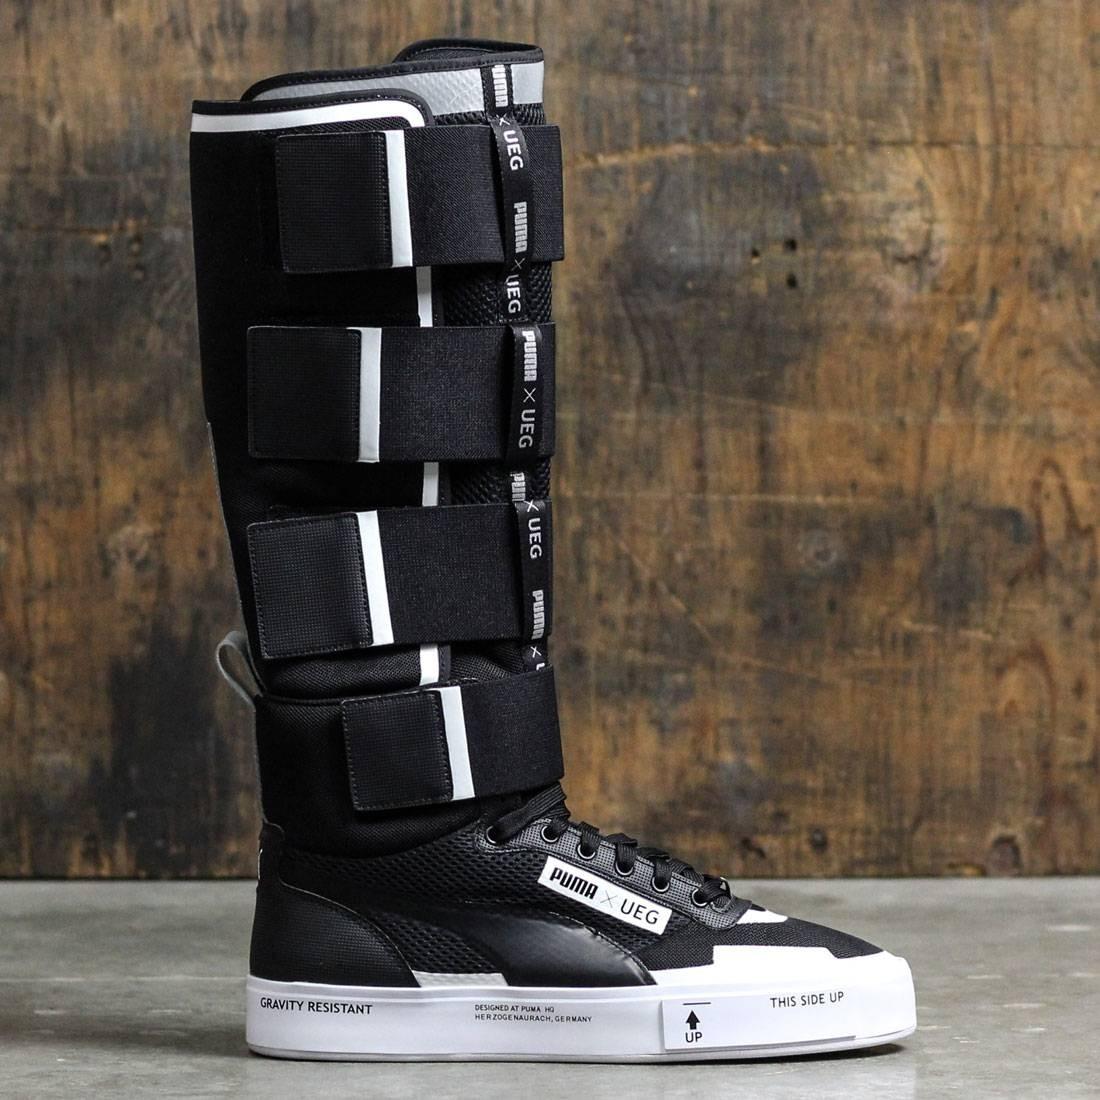 3df4dff74b0 Puma X Ueg Sneakers cv-writing-jobs-recruitment-uk.co.uk